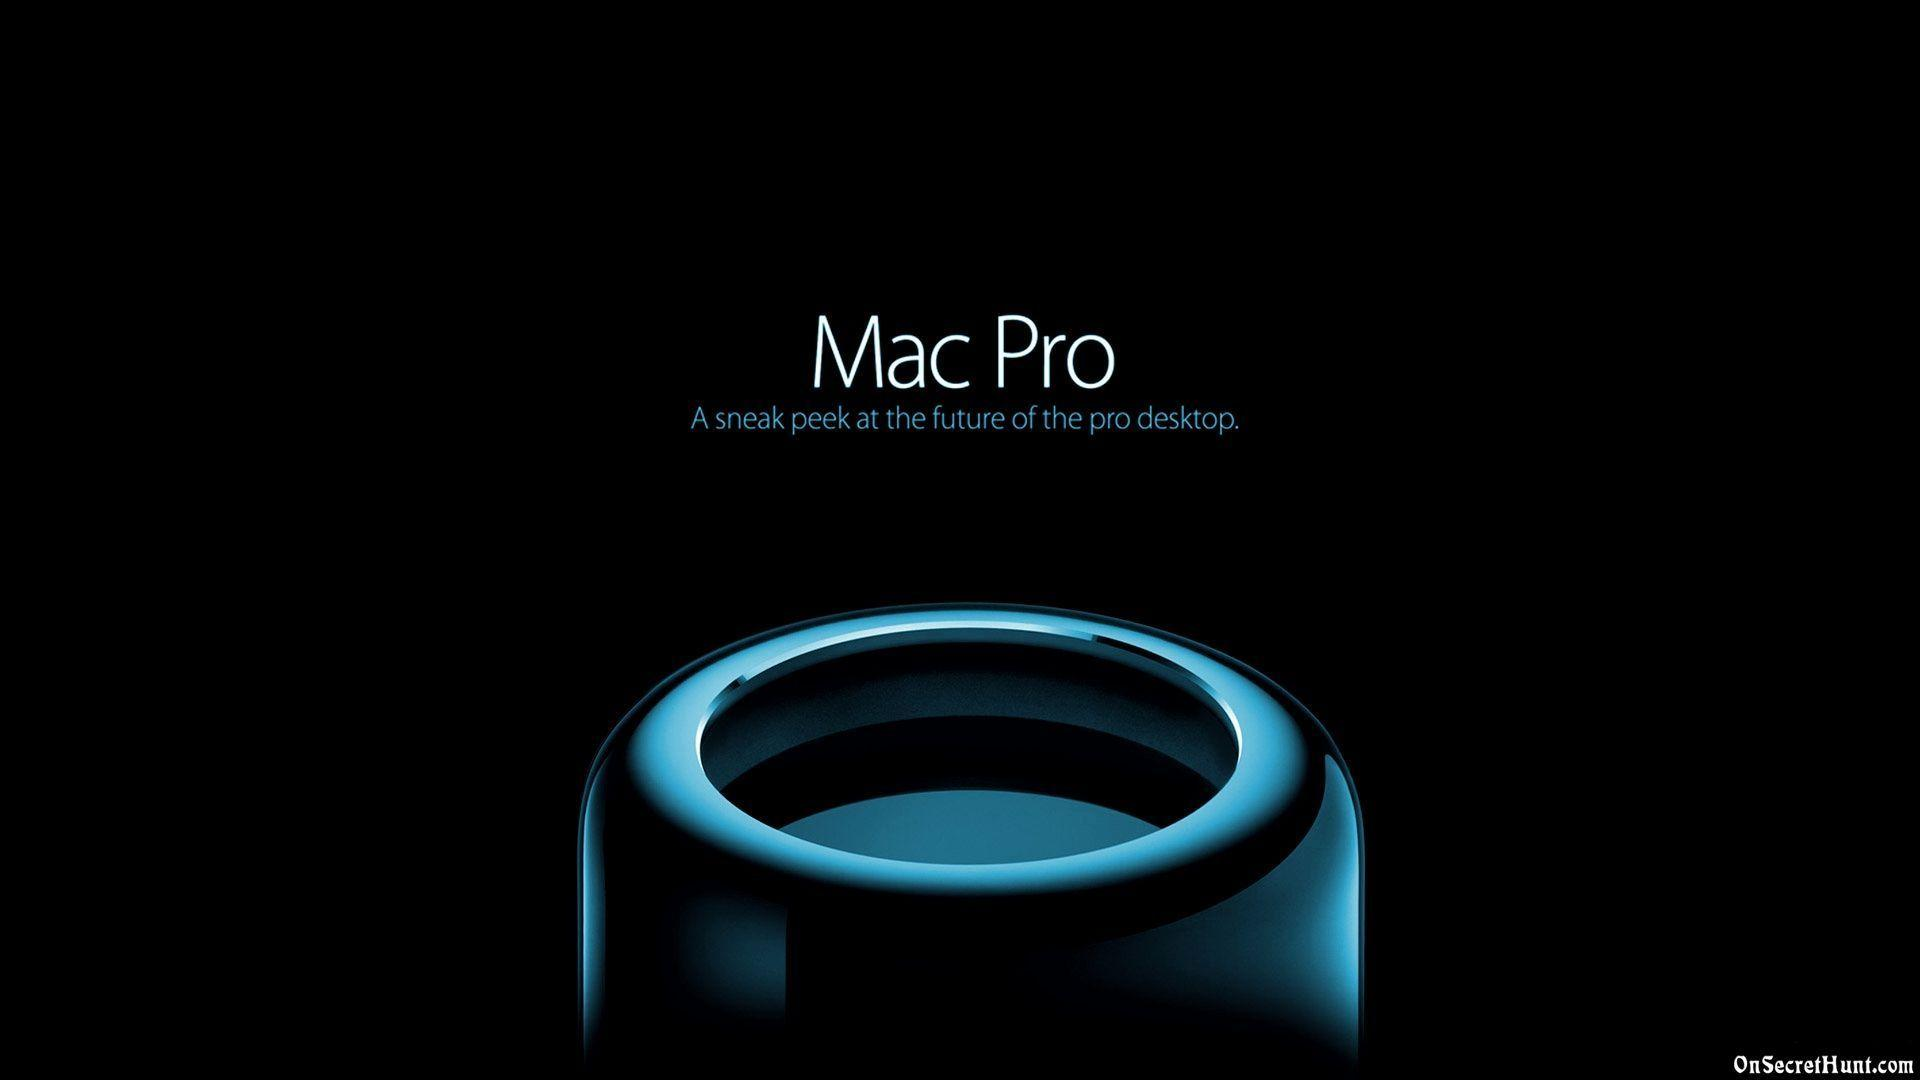 Mac Pro Backgrounds 1920x1080